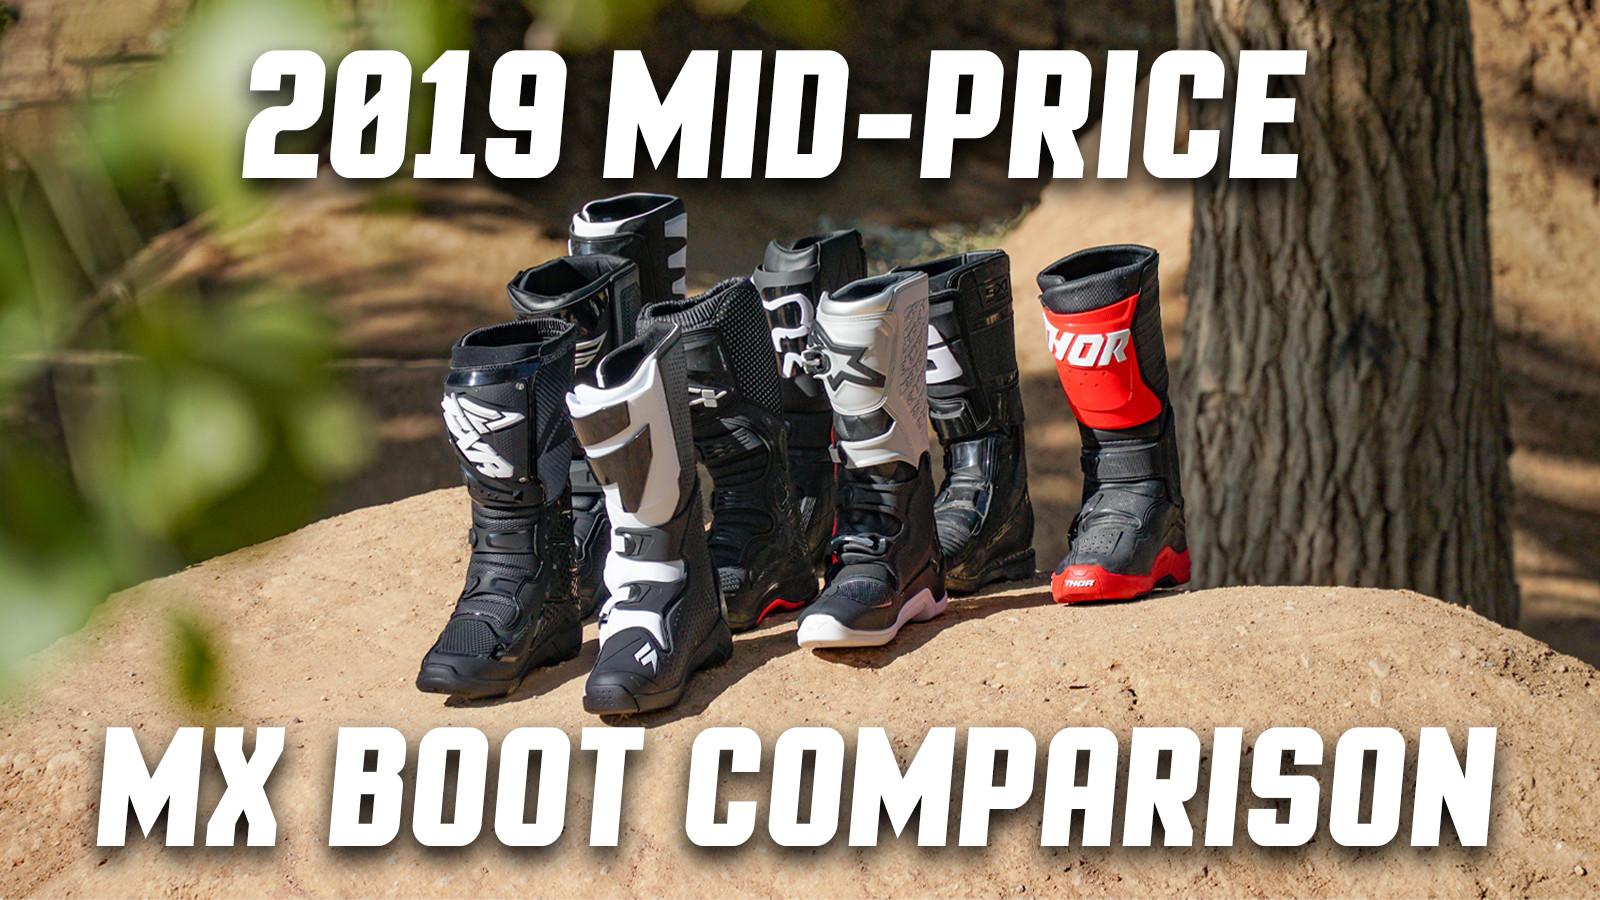 2019 Mid-Price Motocross Boot Comparison